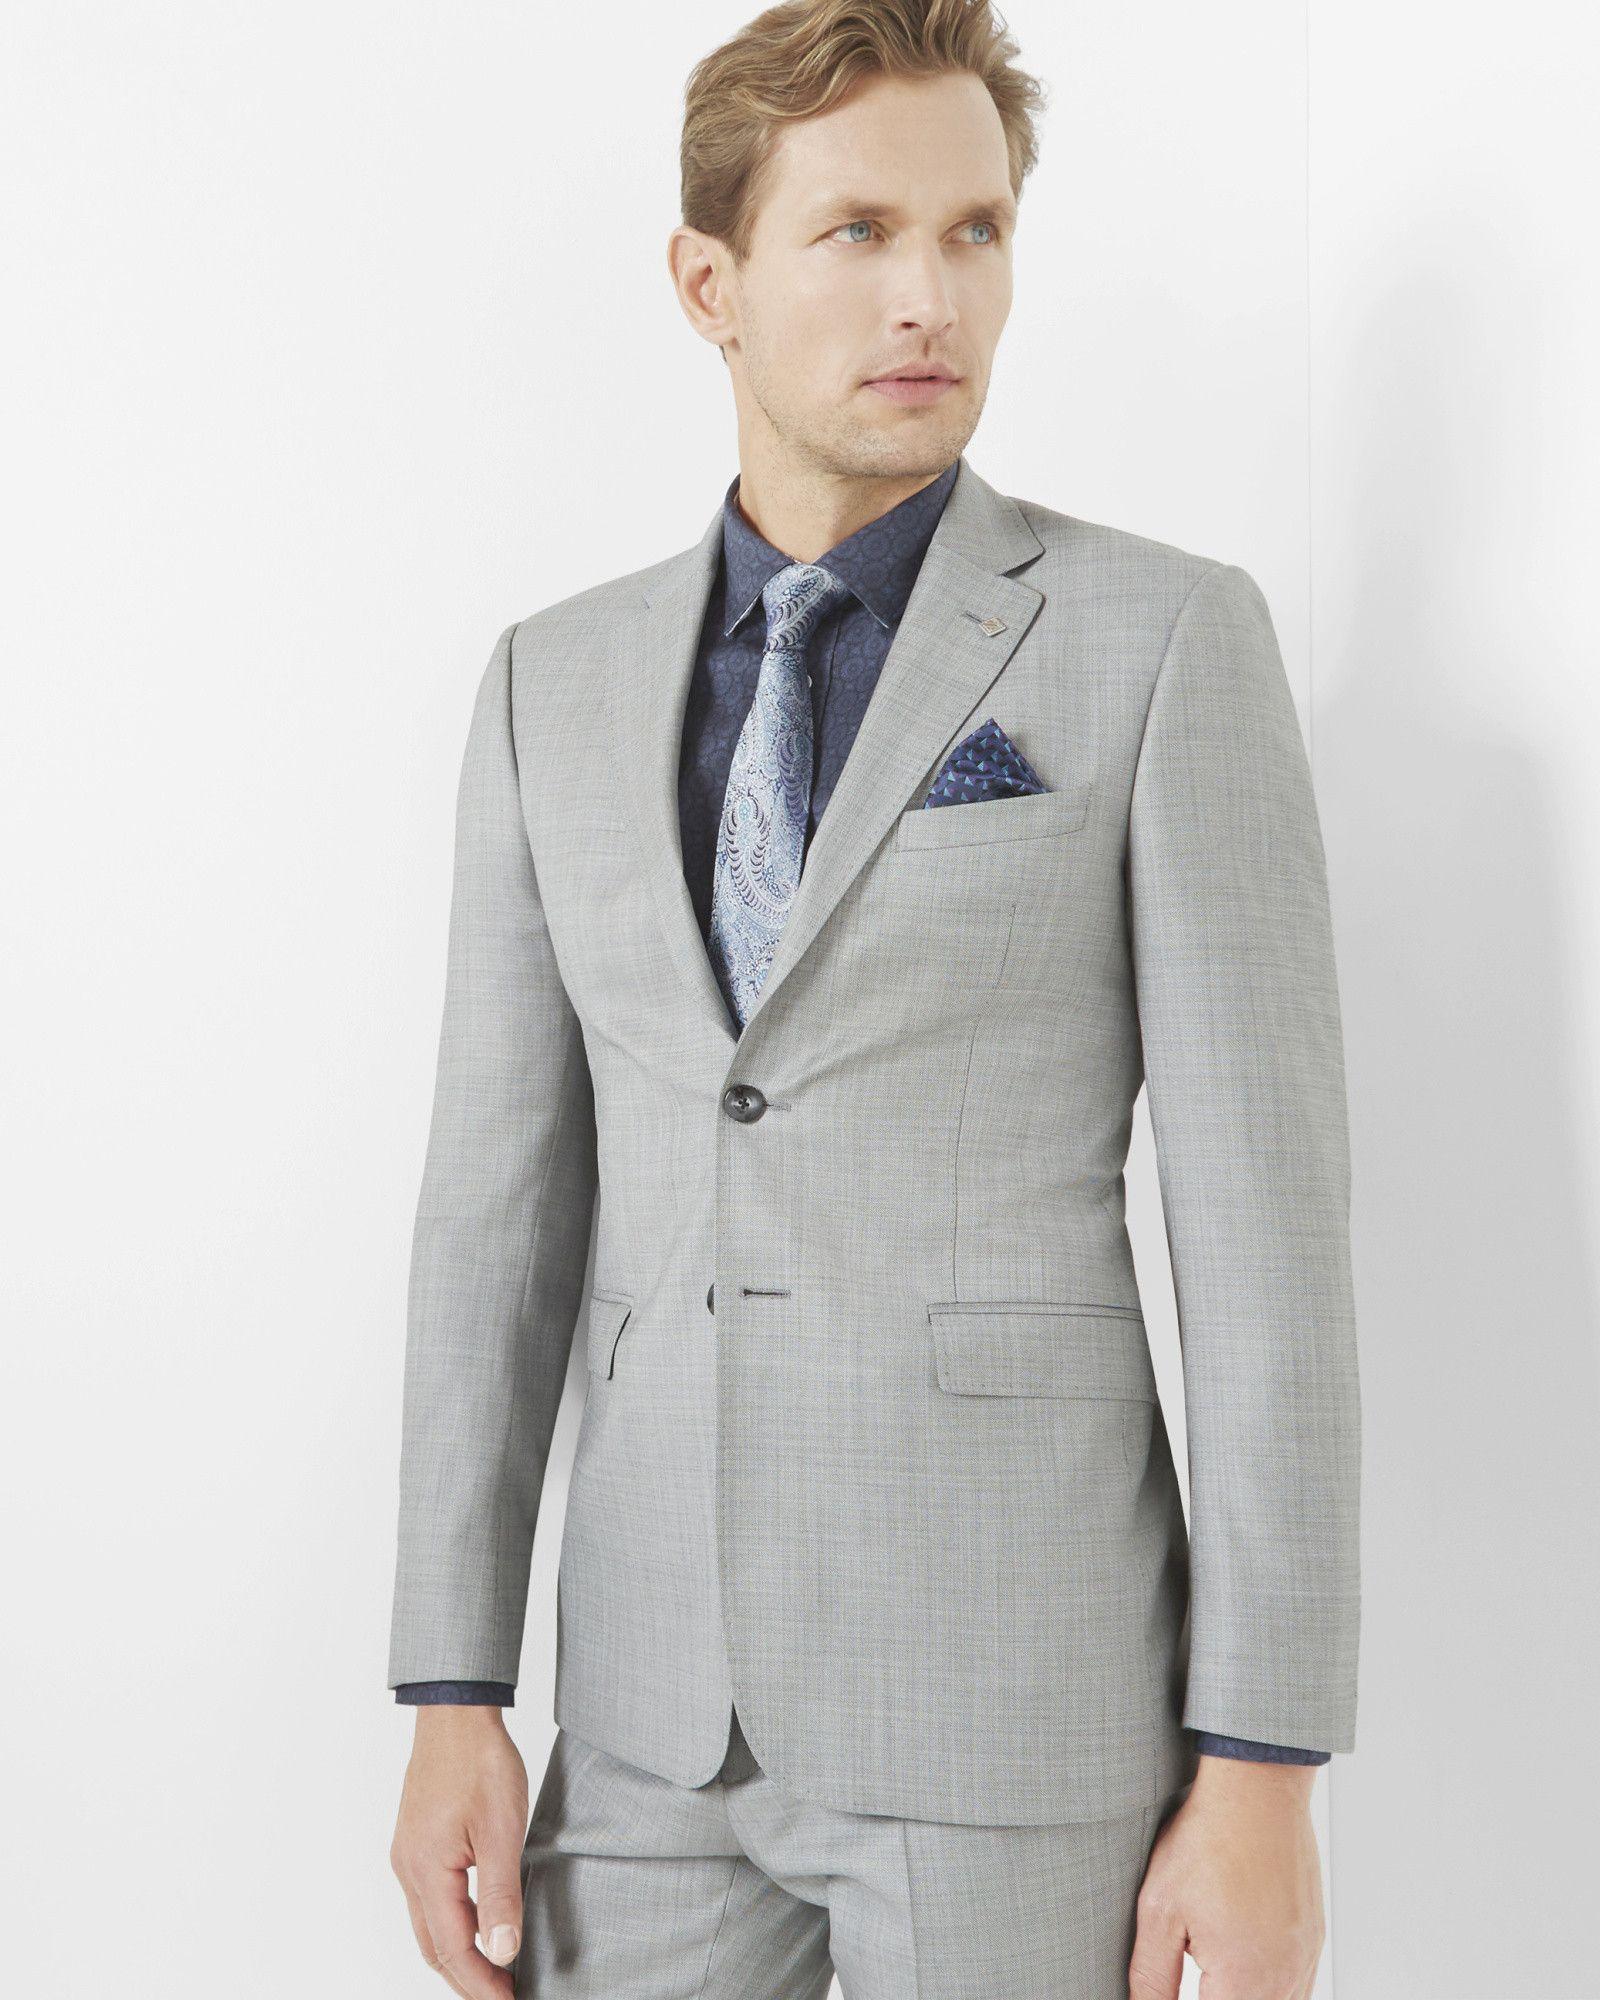 8d201ba5e508 Debonair wool jacket - Light Gray